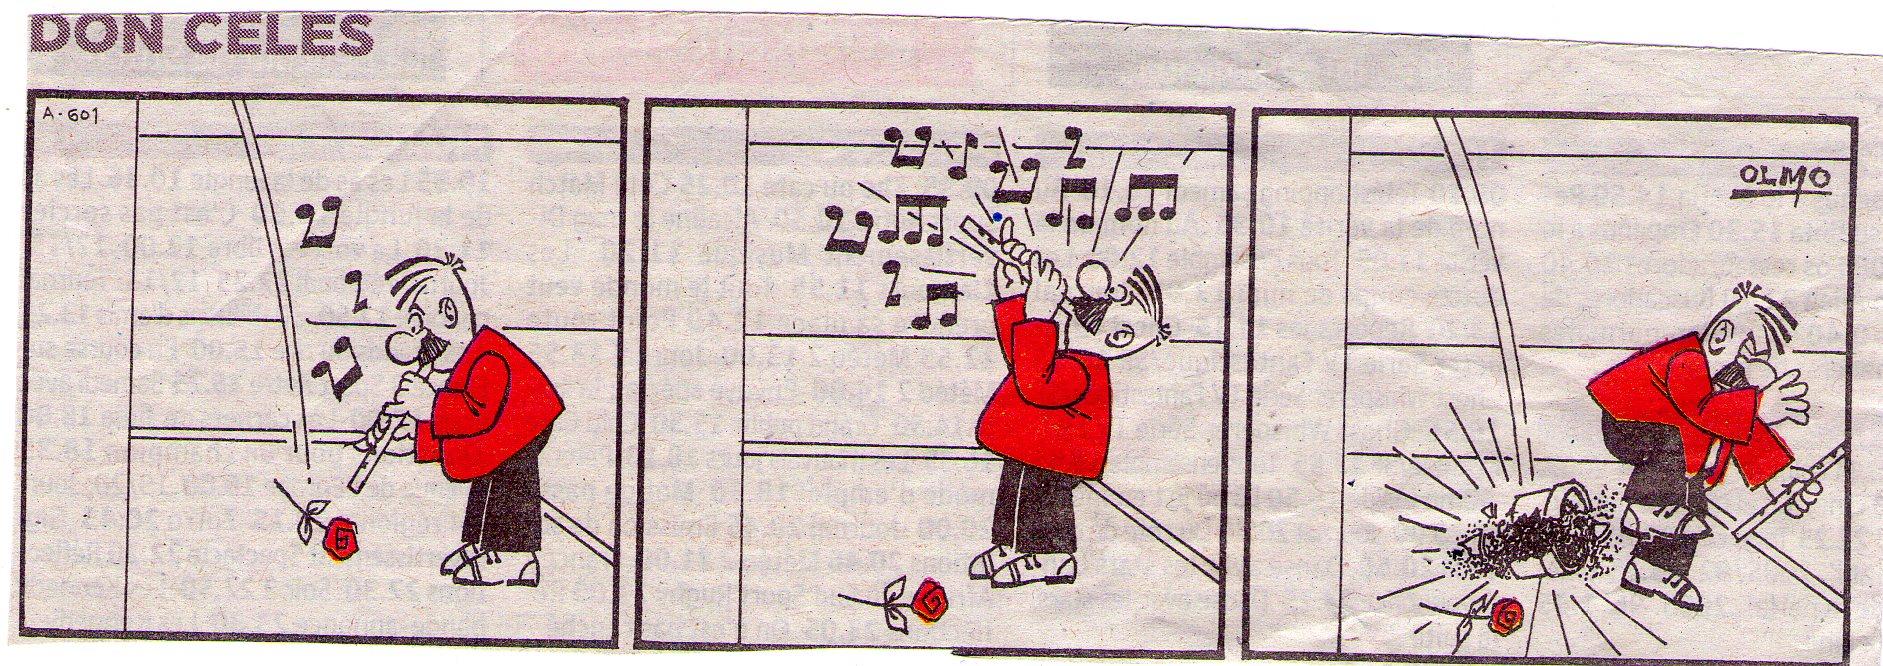 Don Celes tocando la flauta